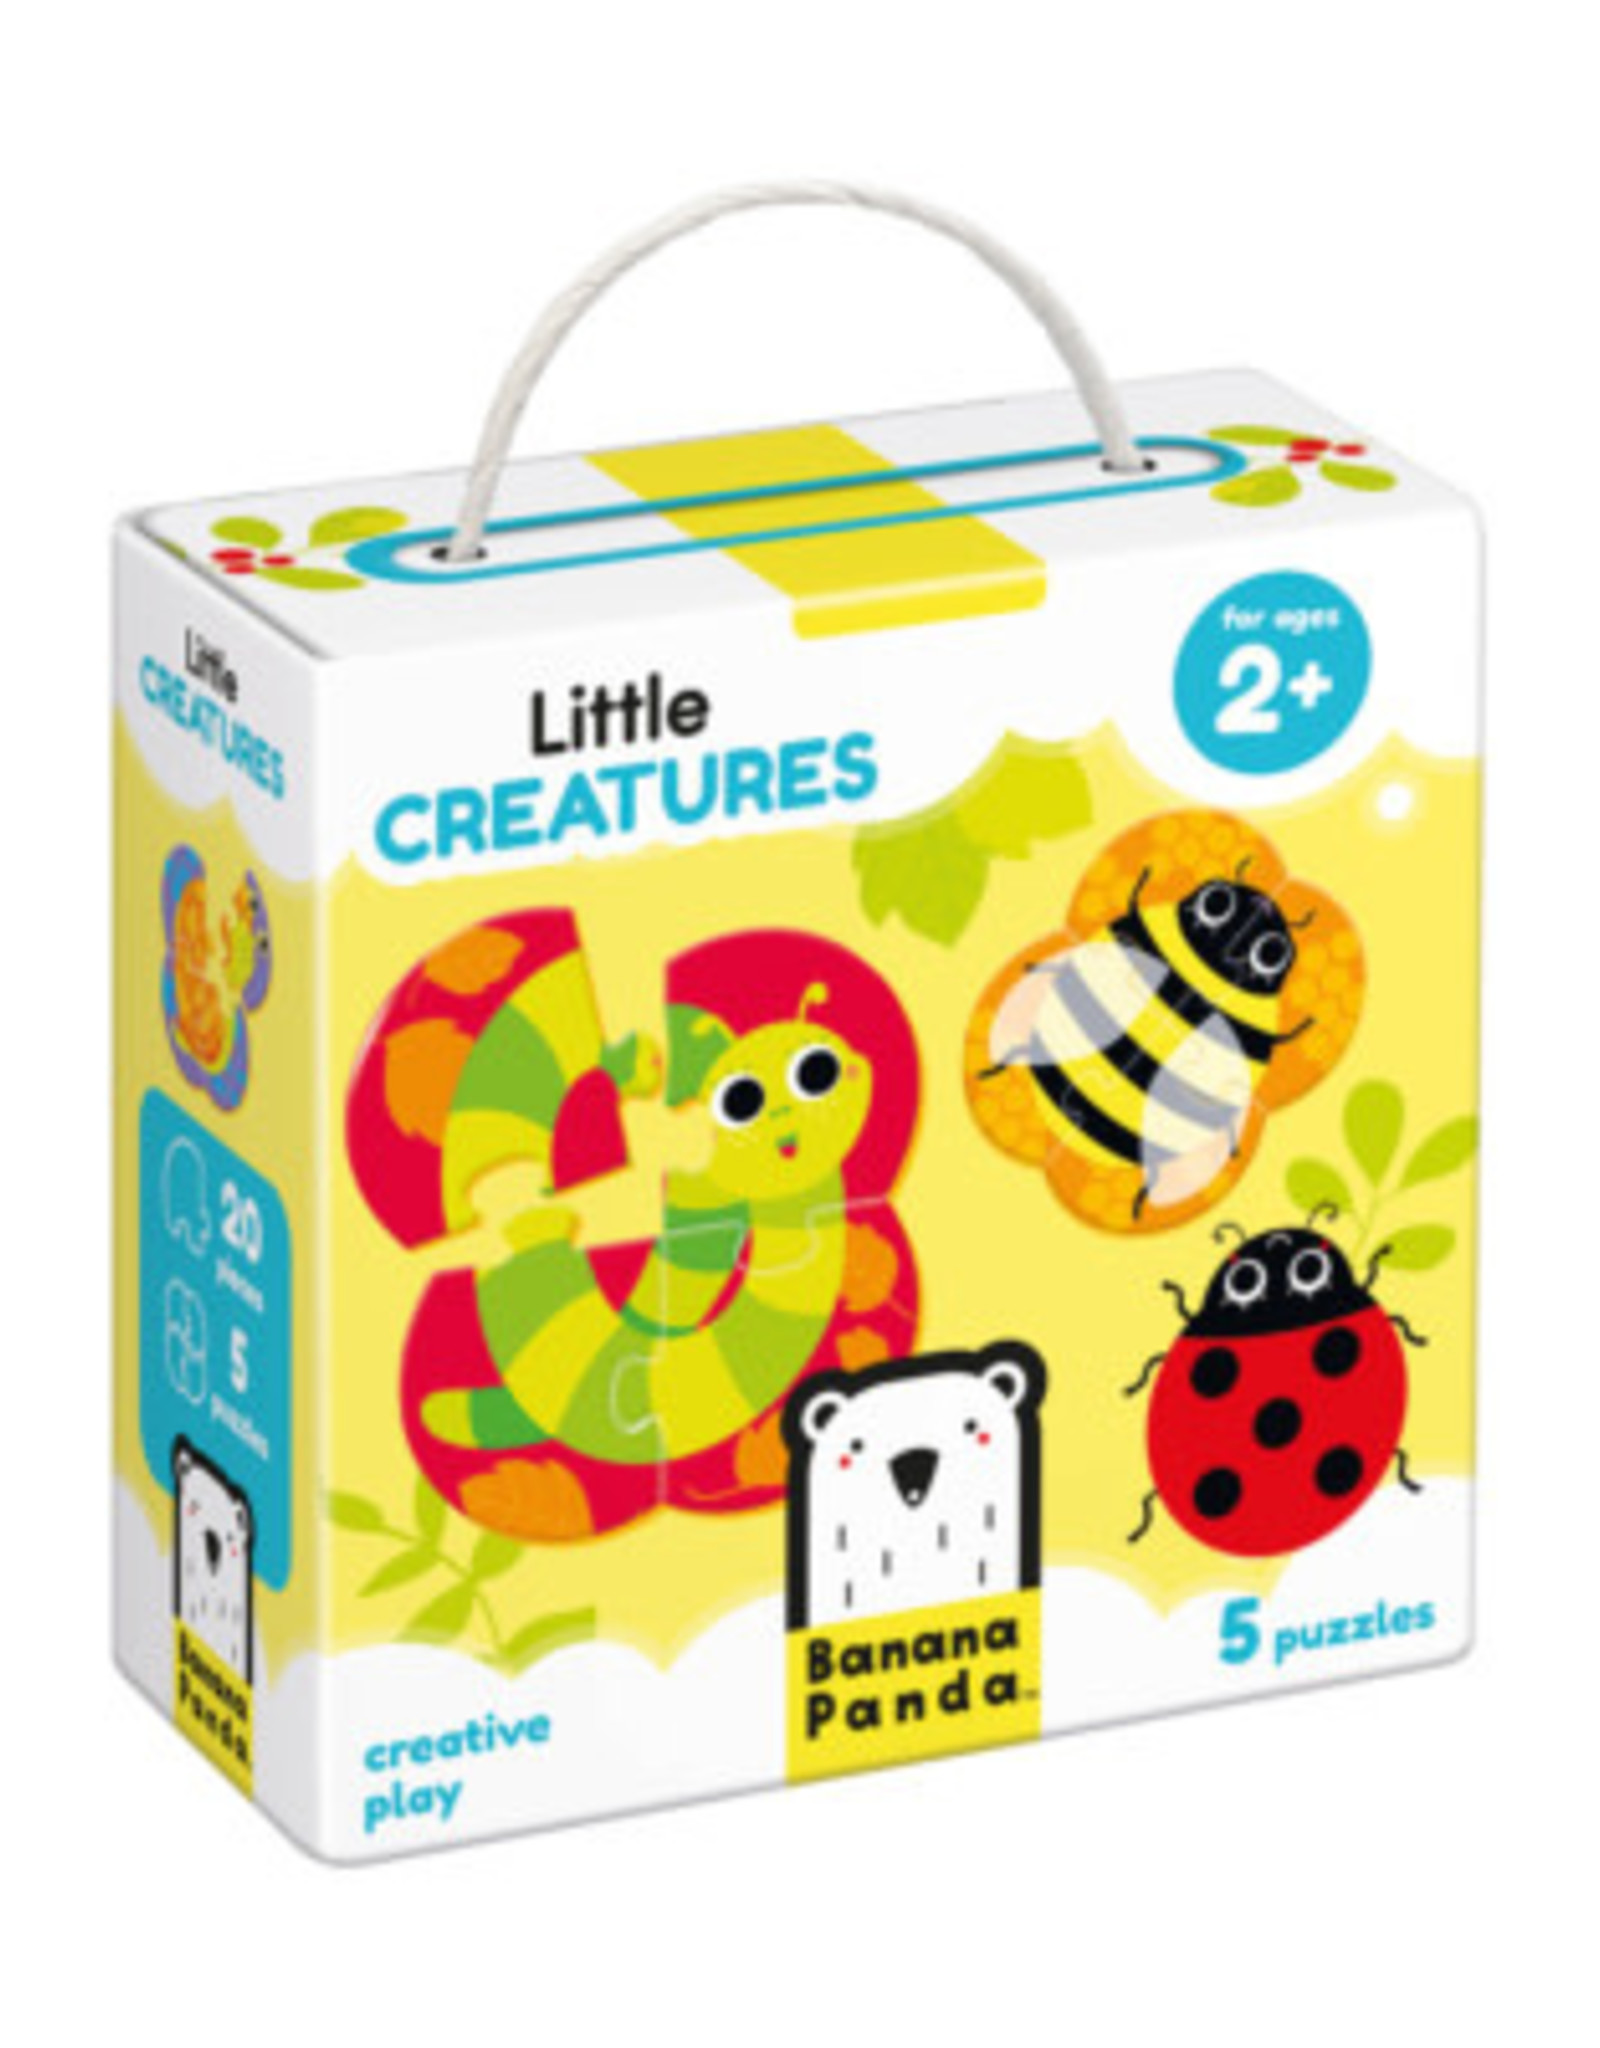 Banana Panda Little Creatures Puzzles